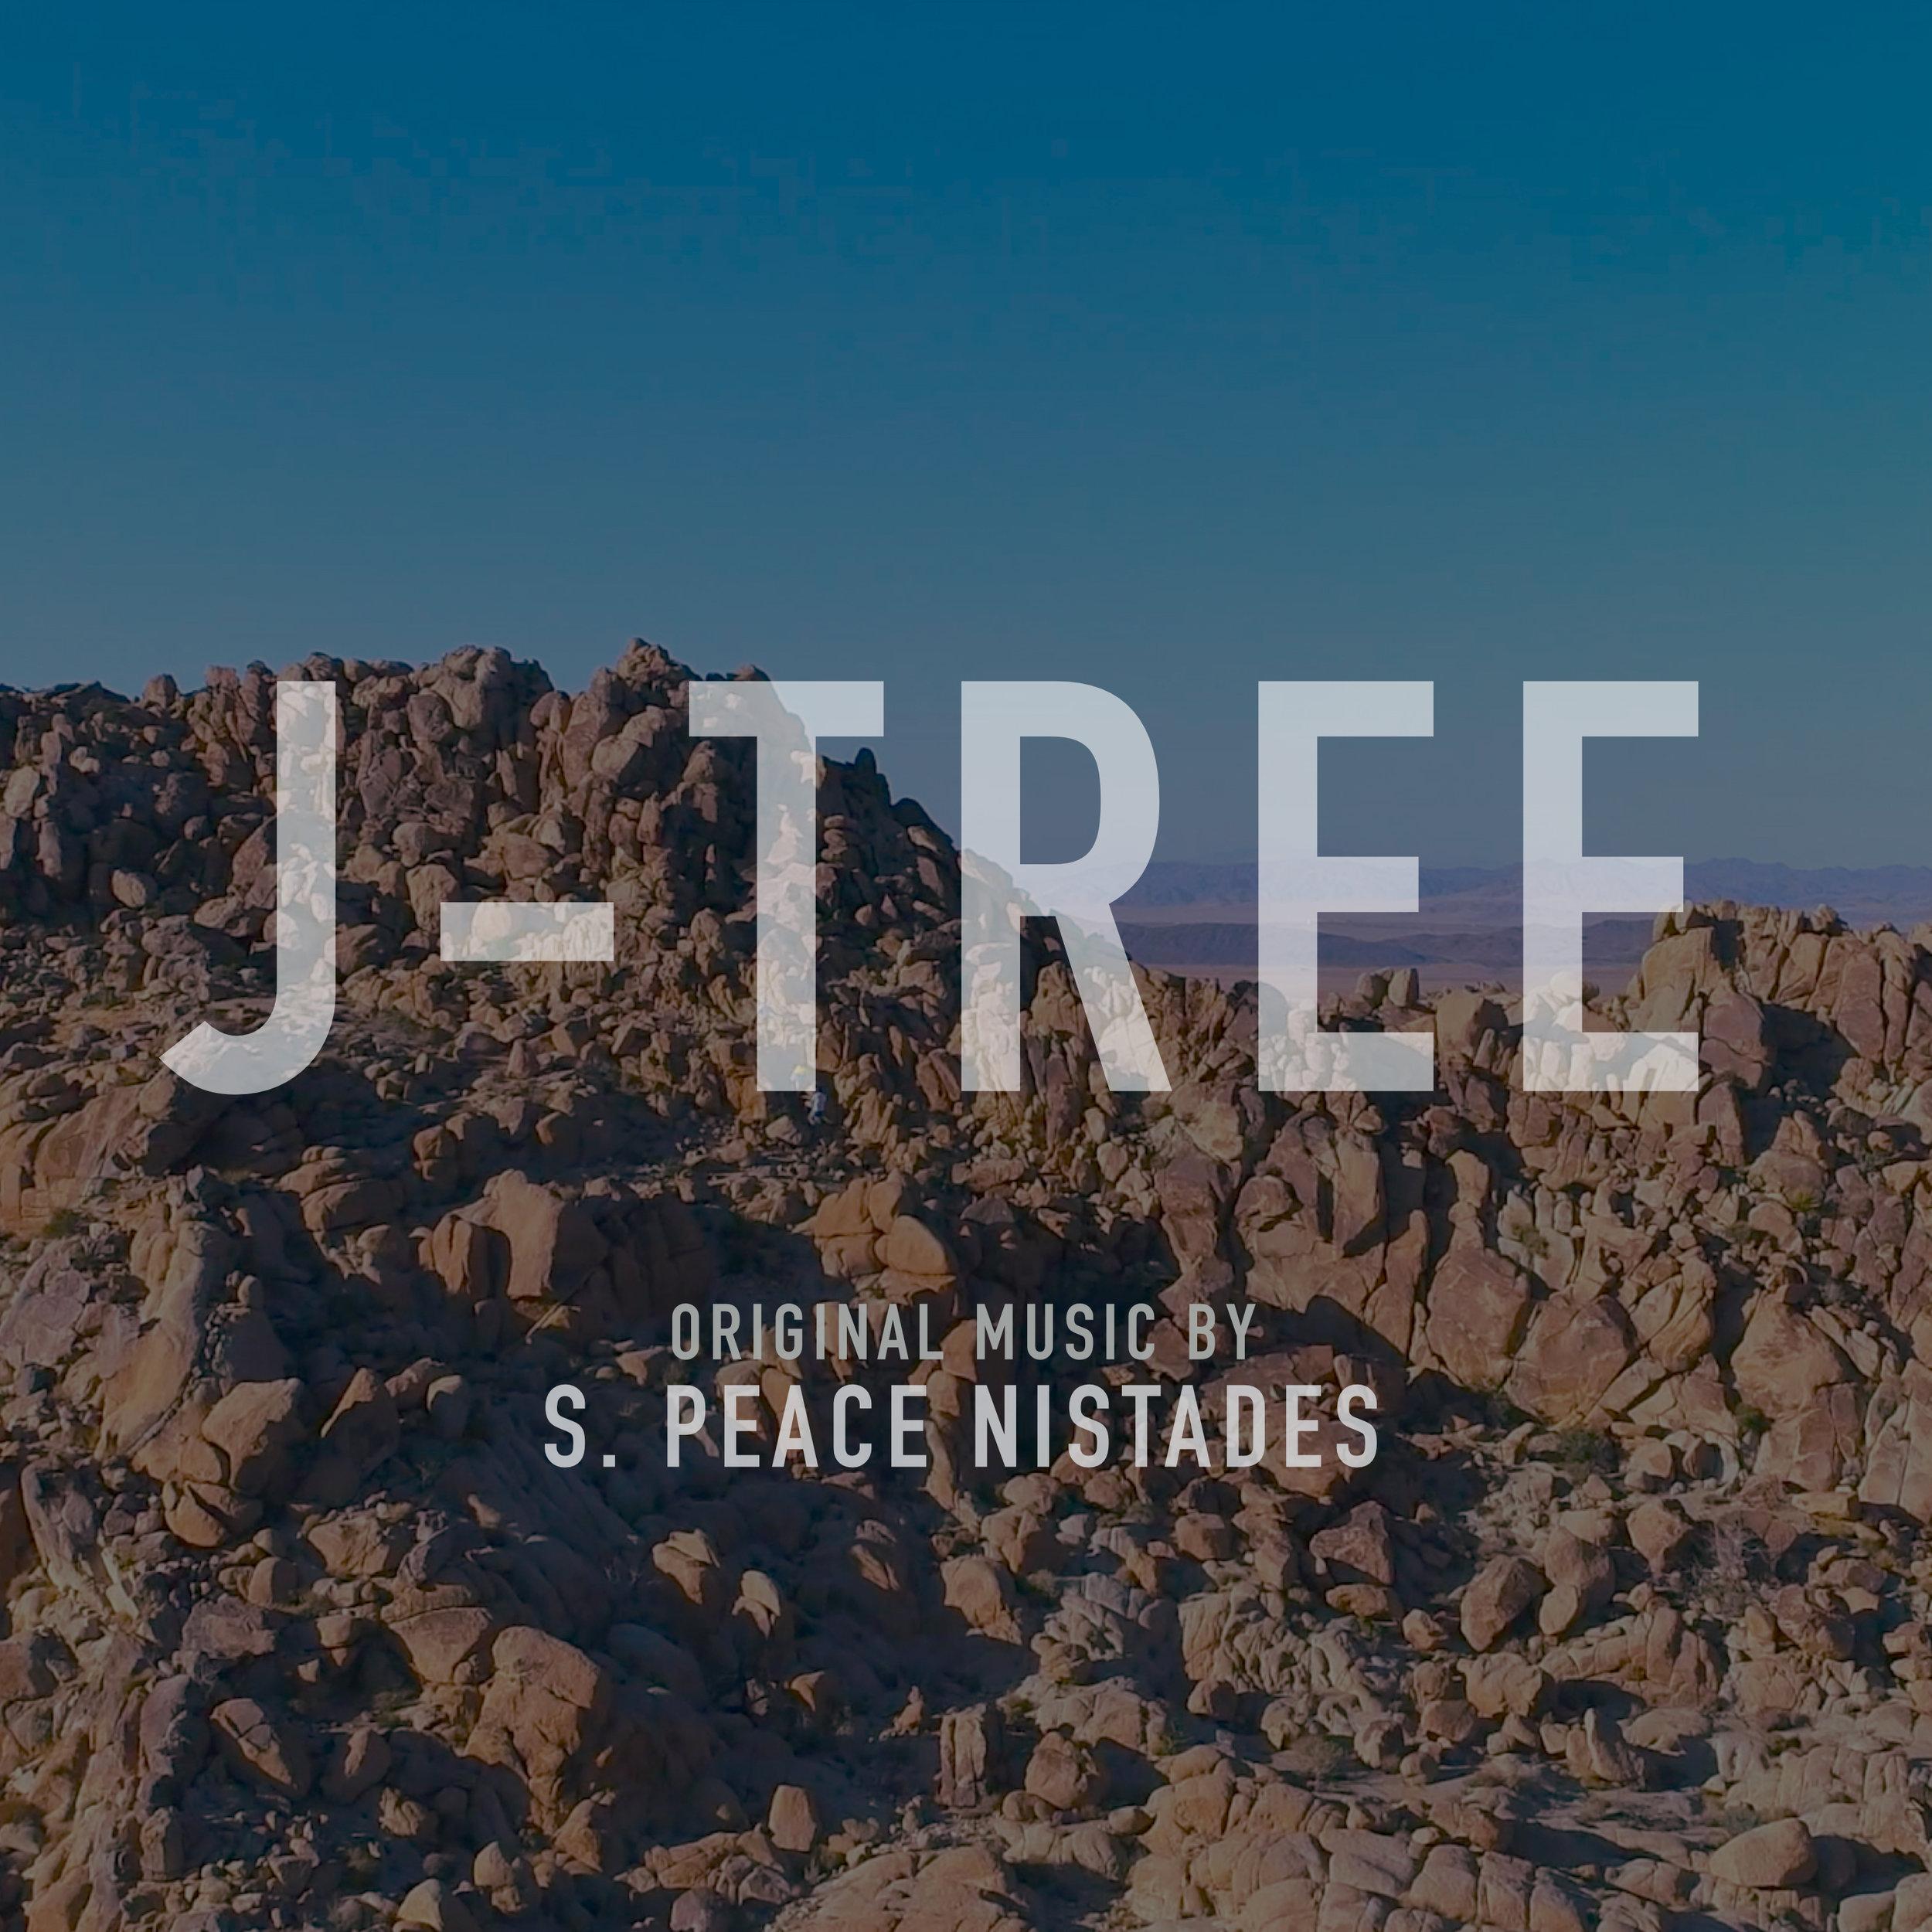 J-TREE Album Cover.jpg